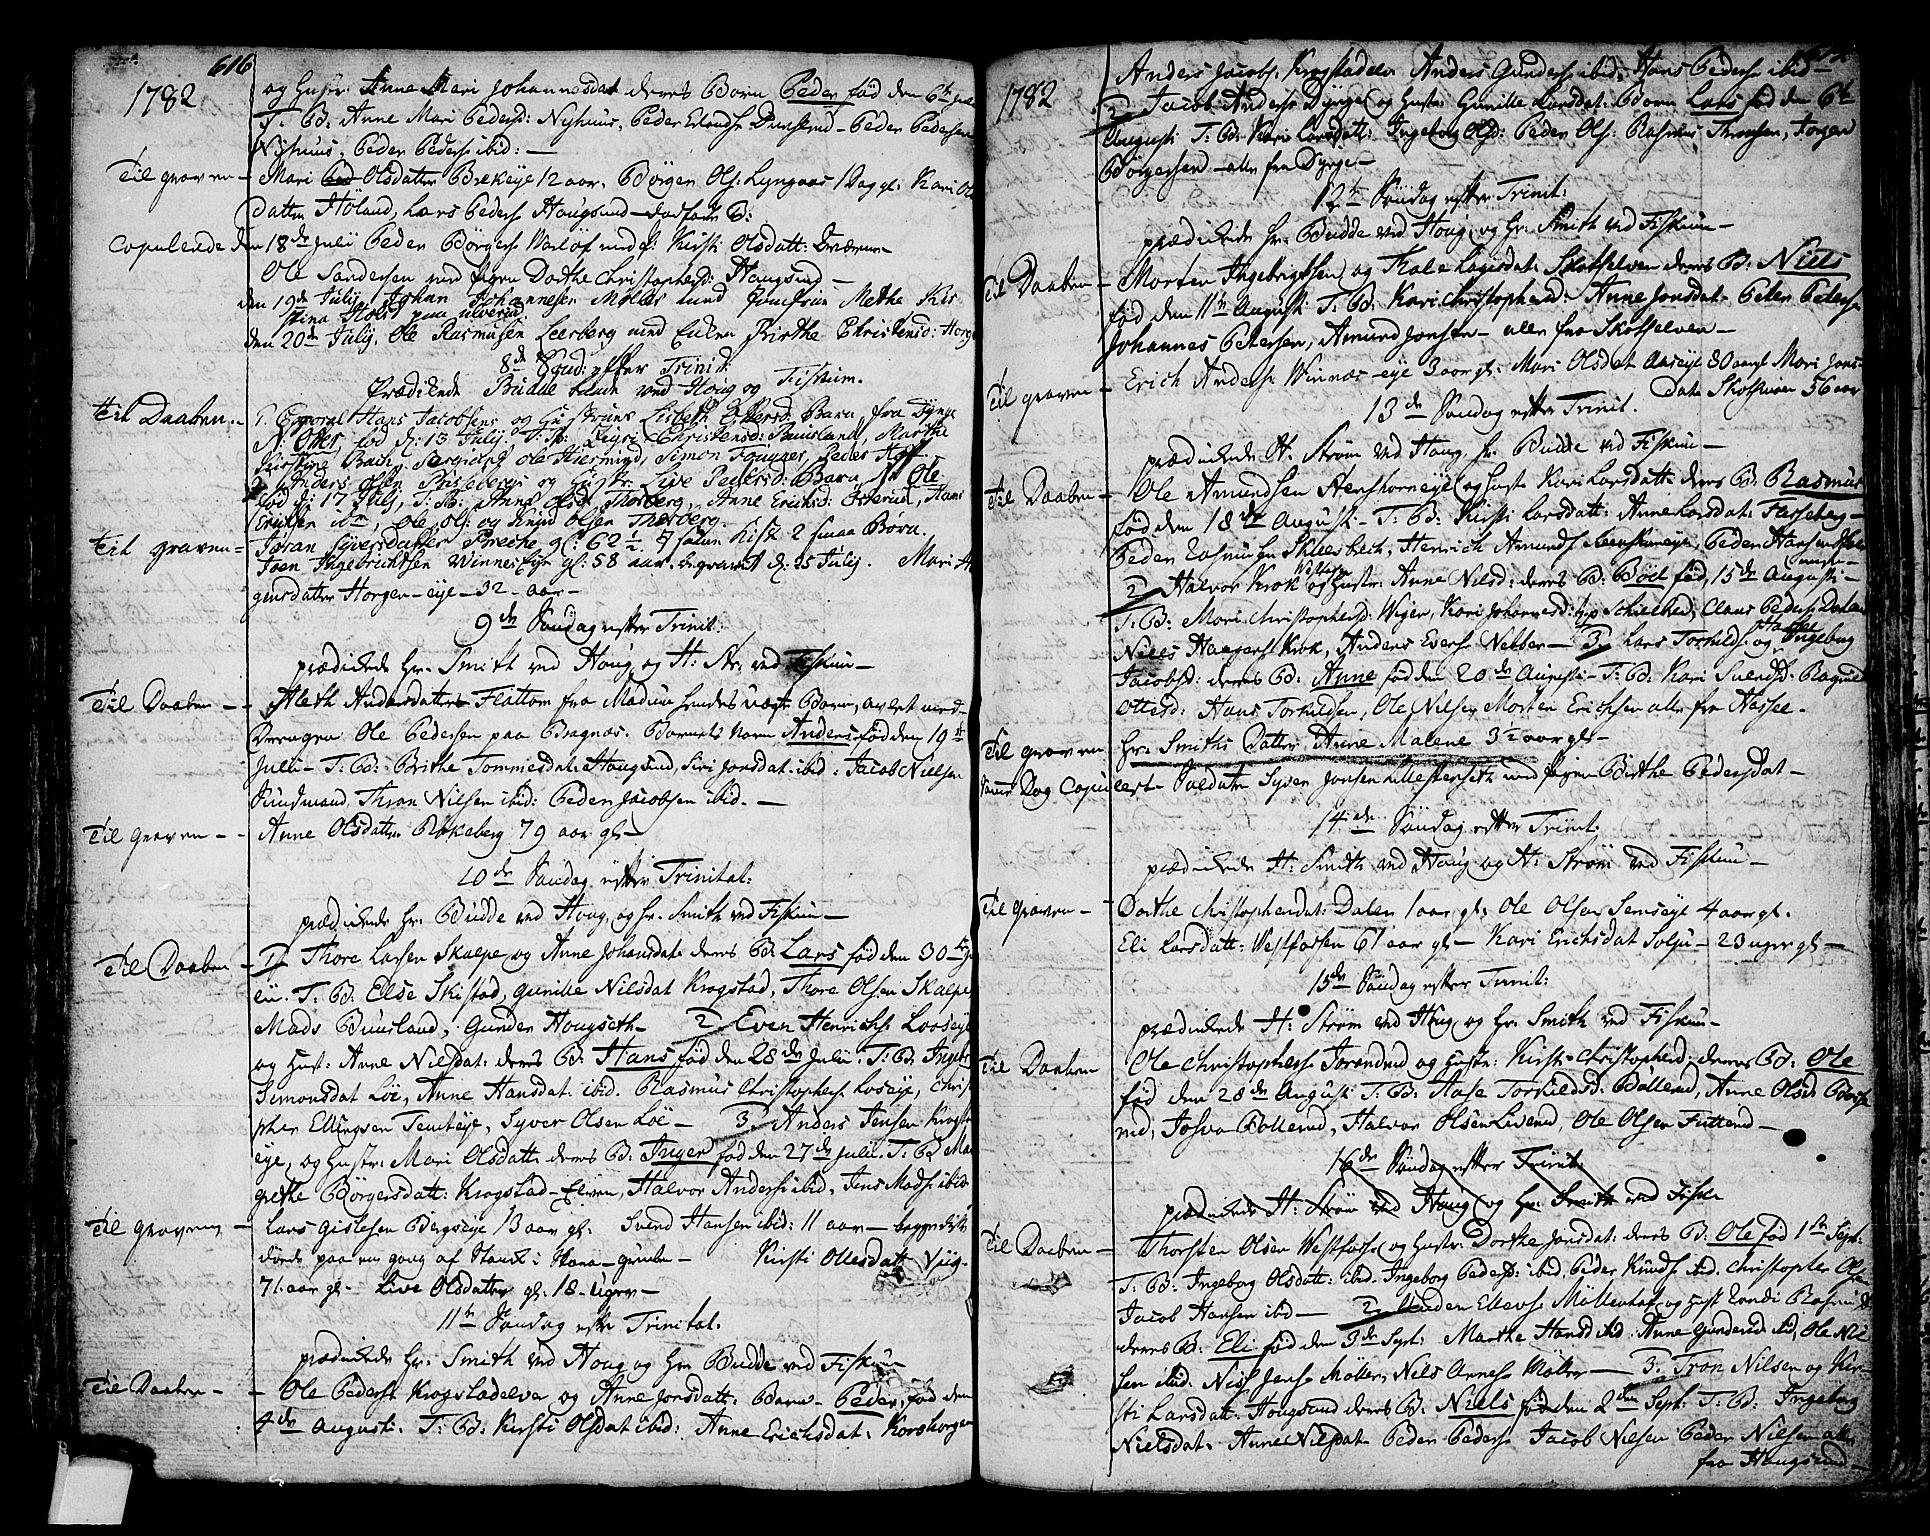 SAKO, Eiker kirkebøker, F/Fa/L0008: Ministerialbok nr. I 8, 1764-1788, s. 616-617